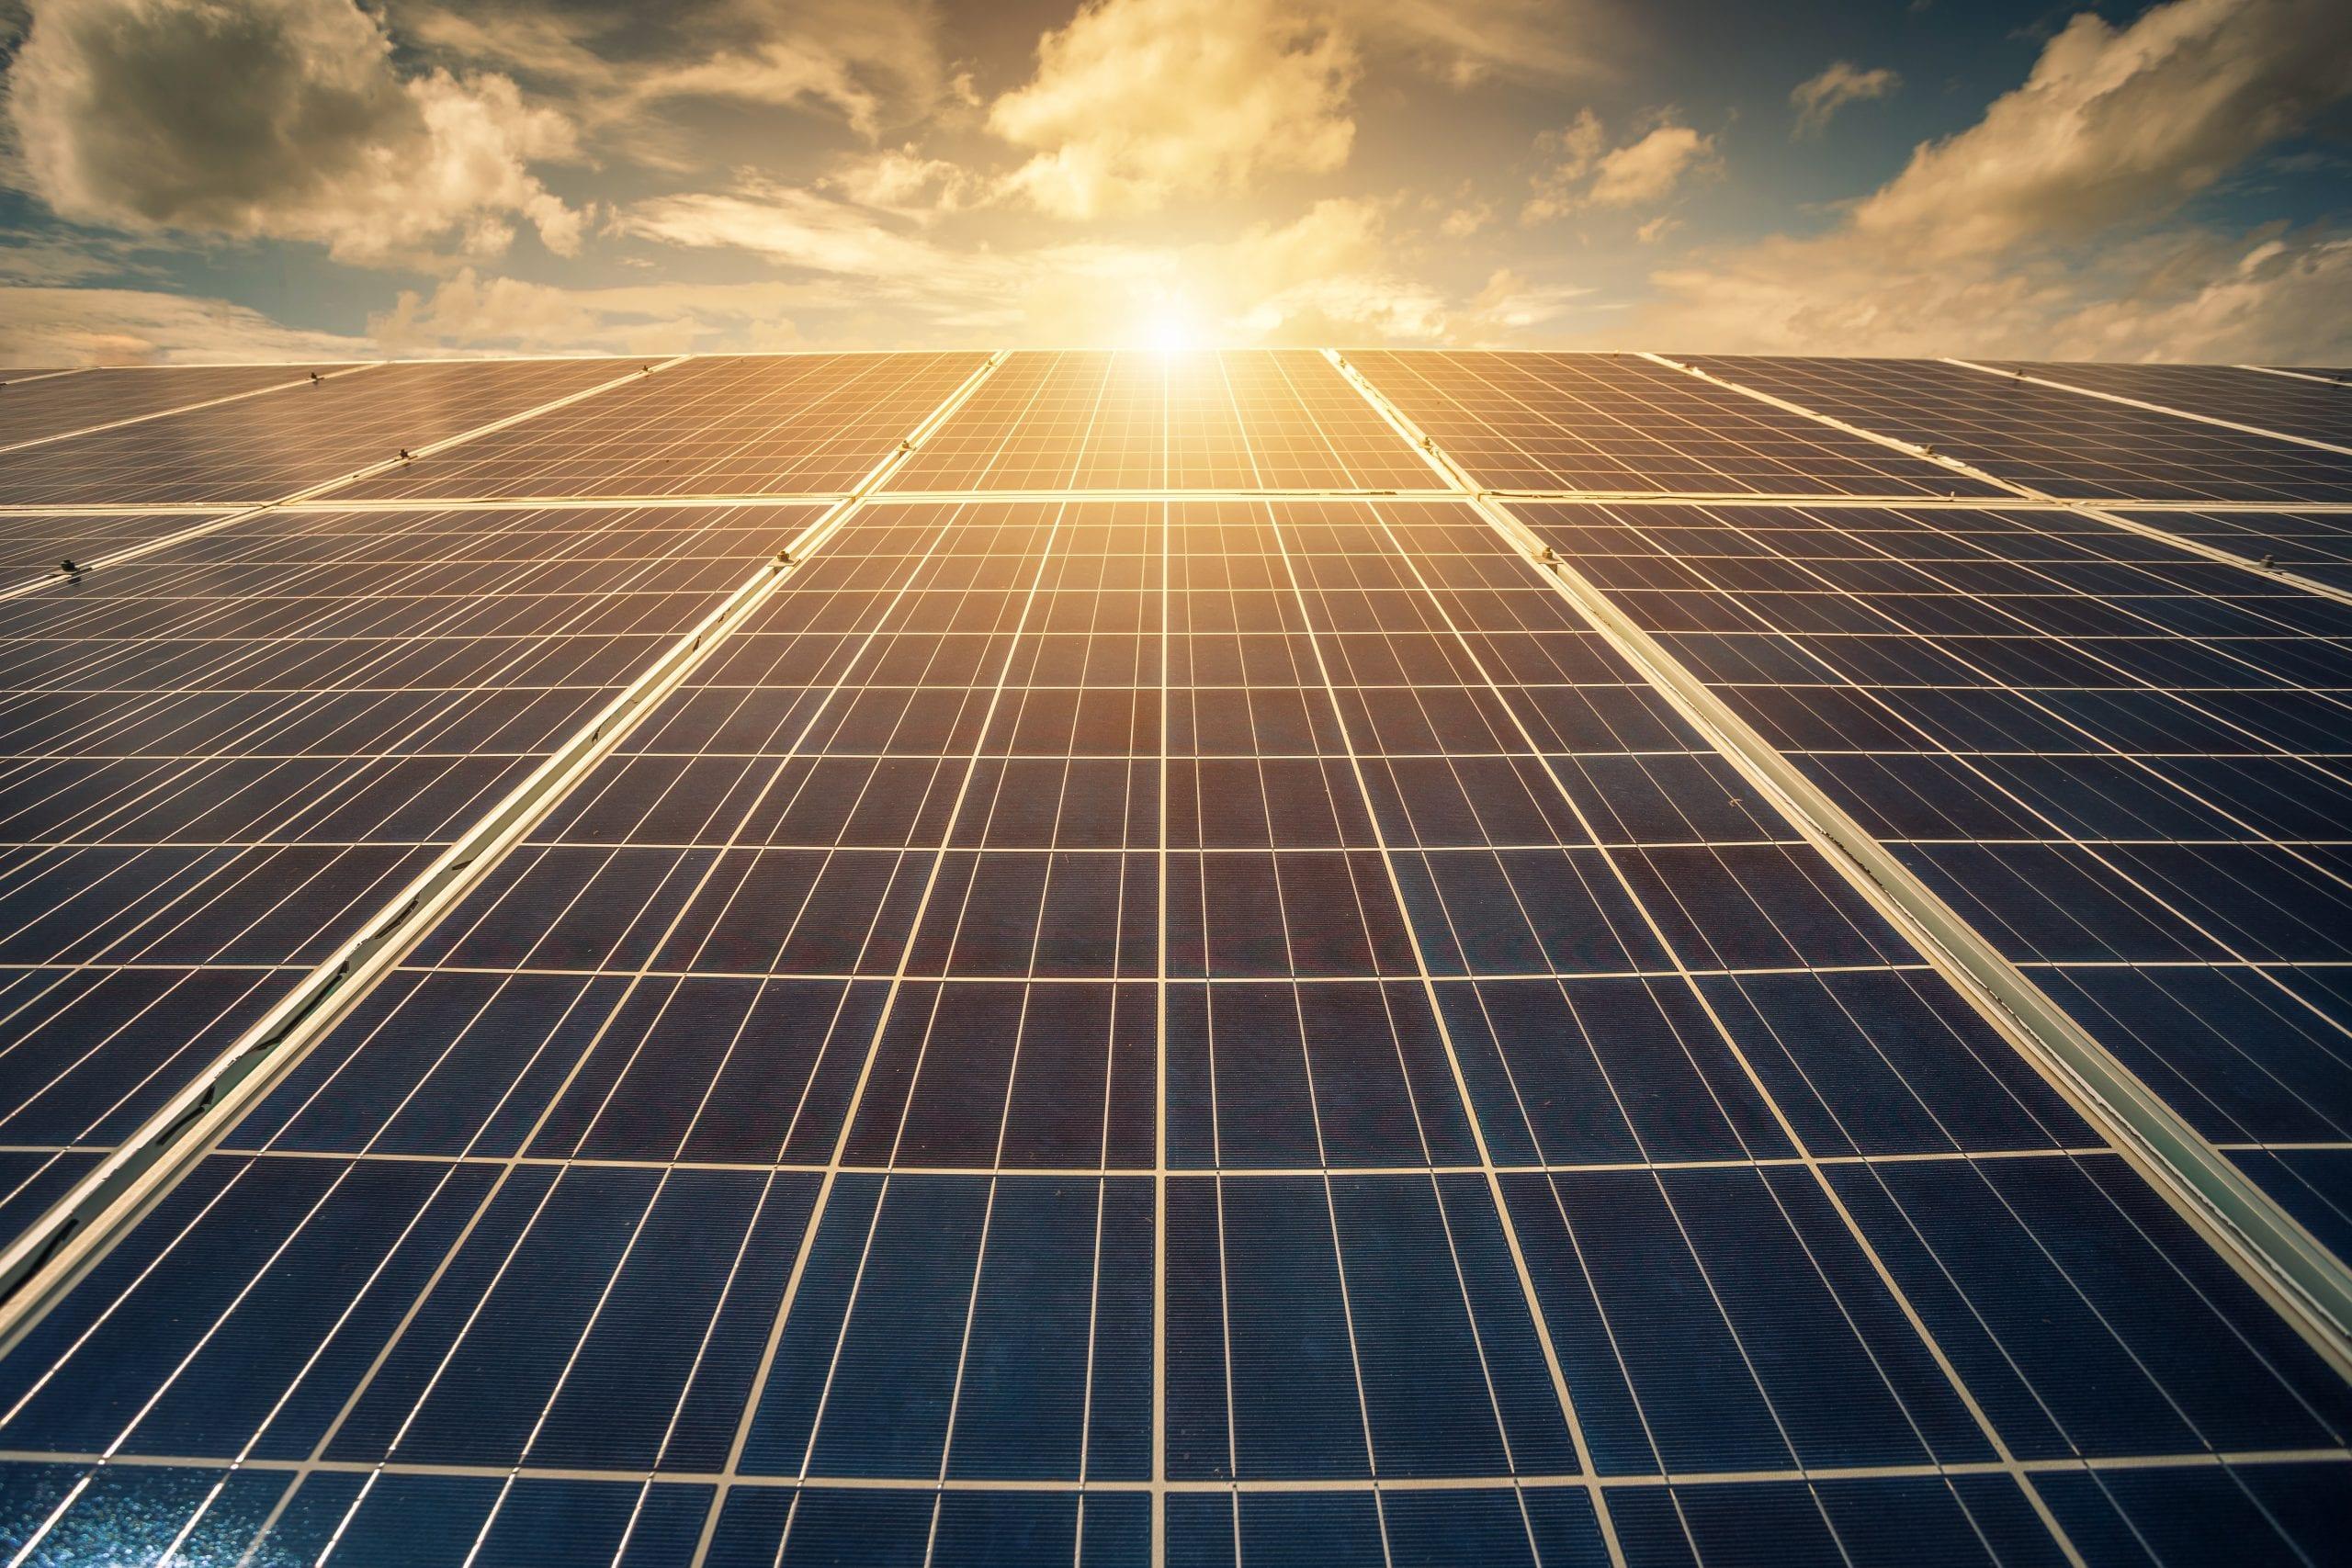 Solar panel on blue sky background, Alternative energy concept,Clean energy,Green energy.